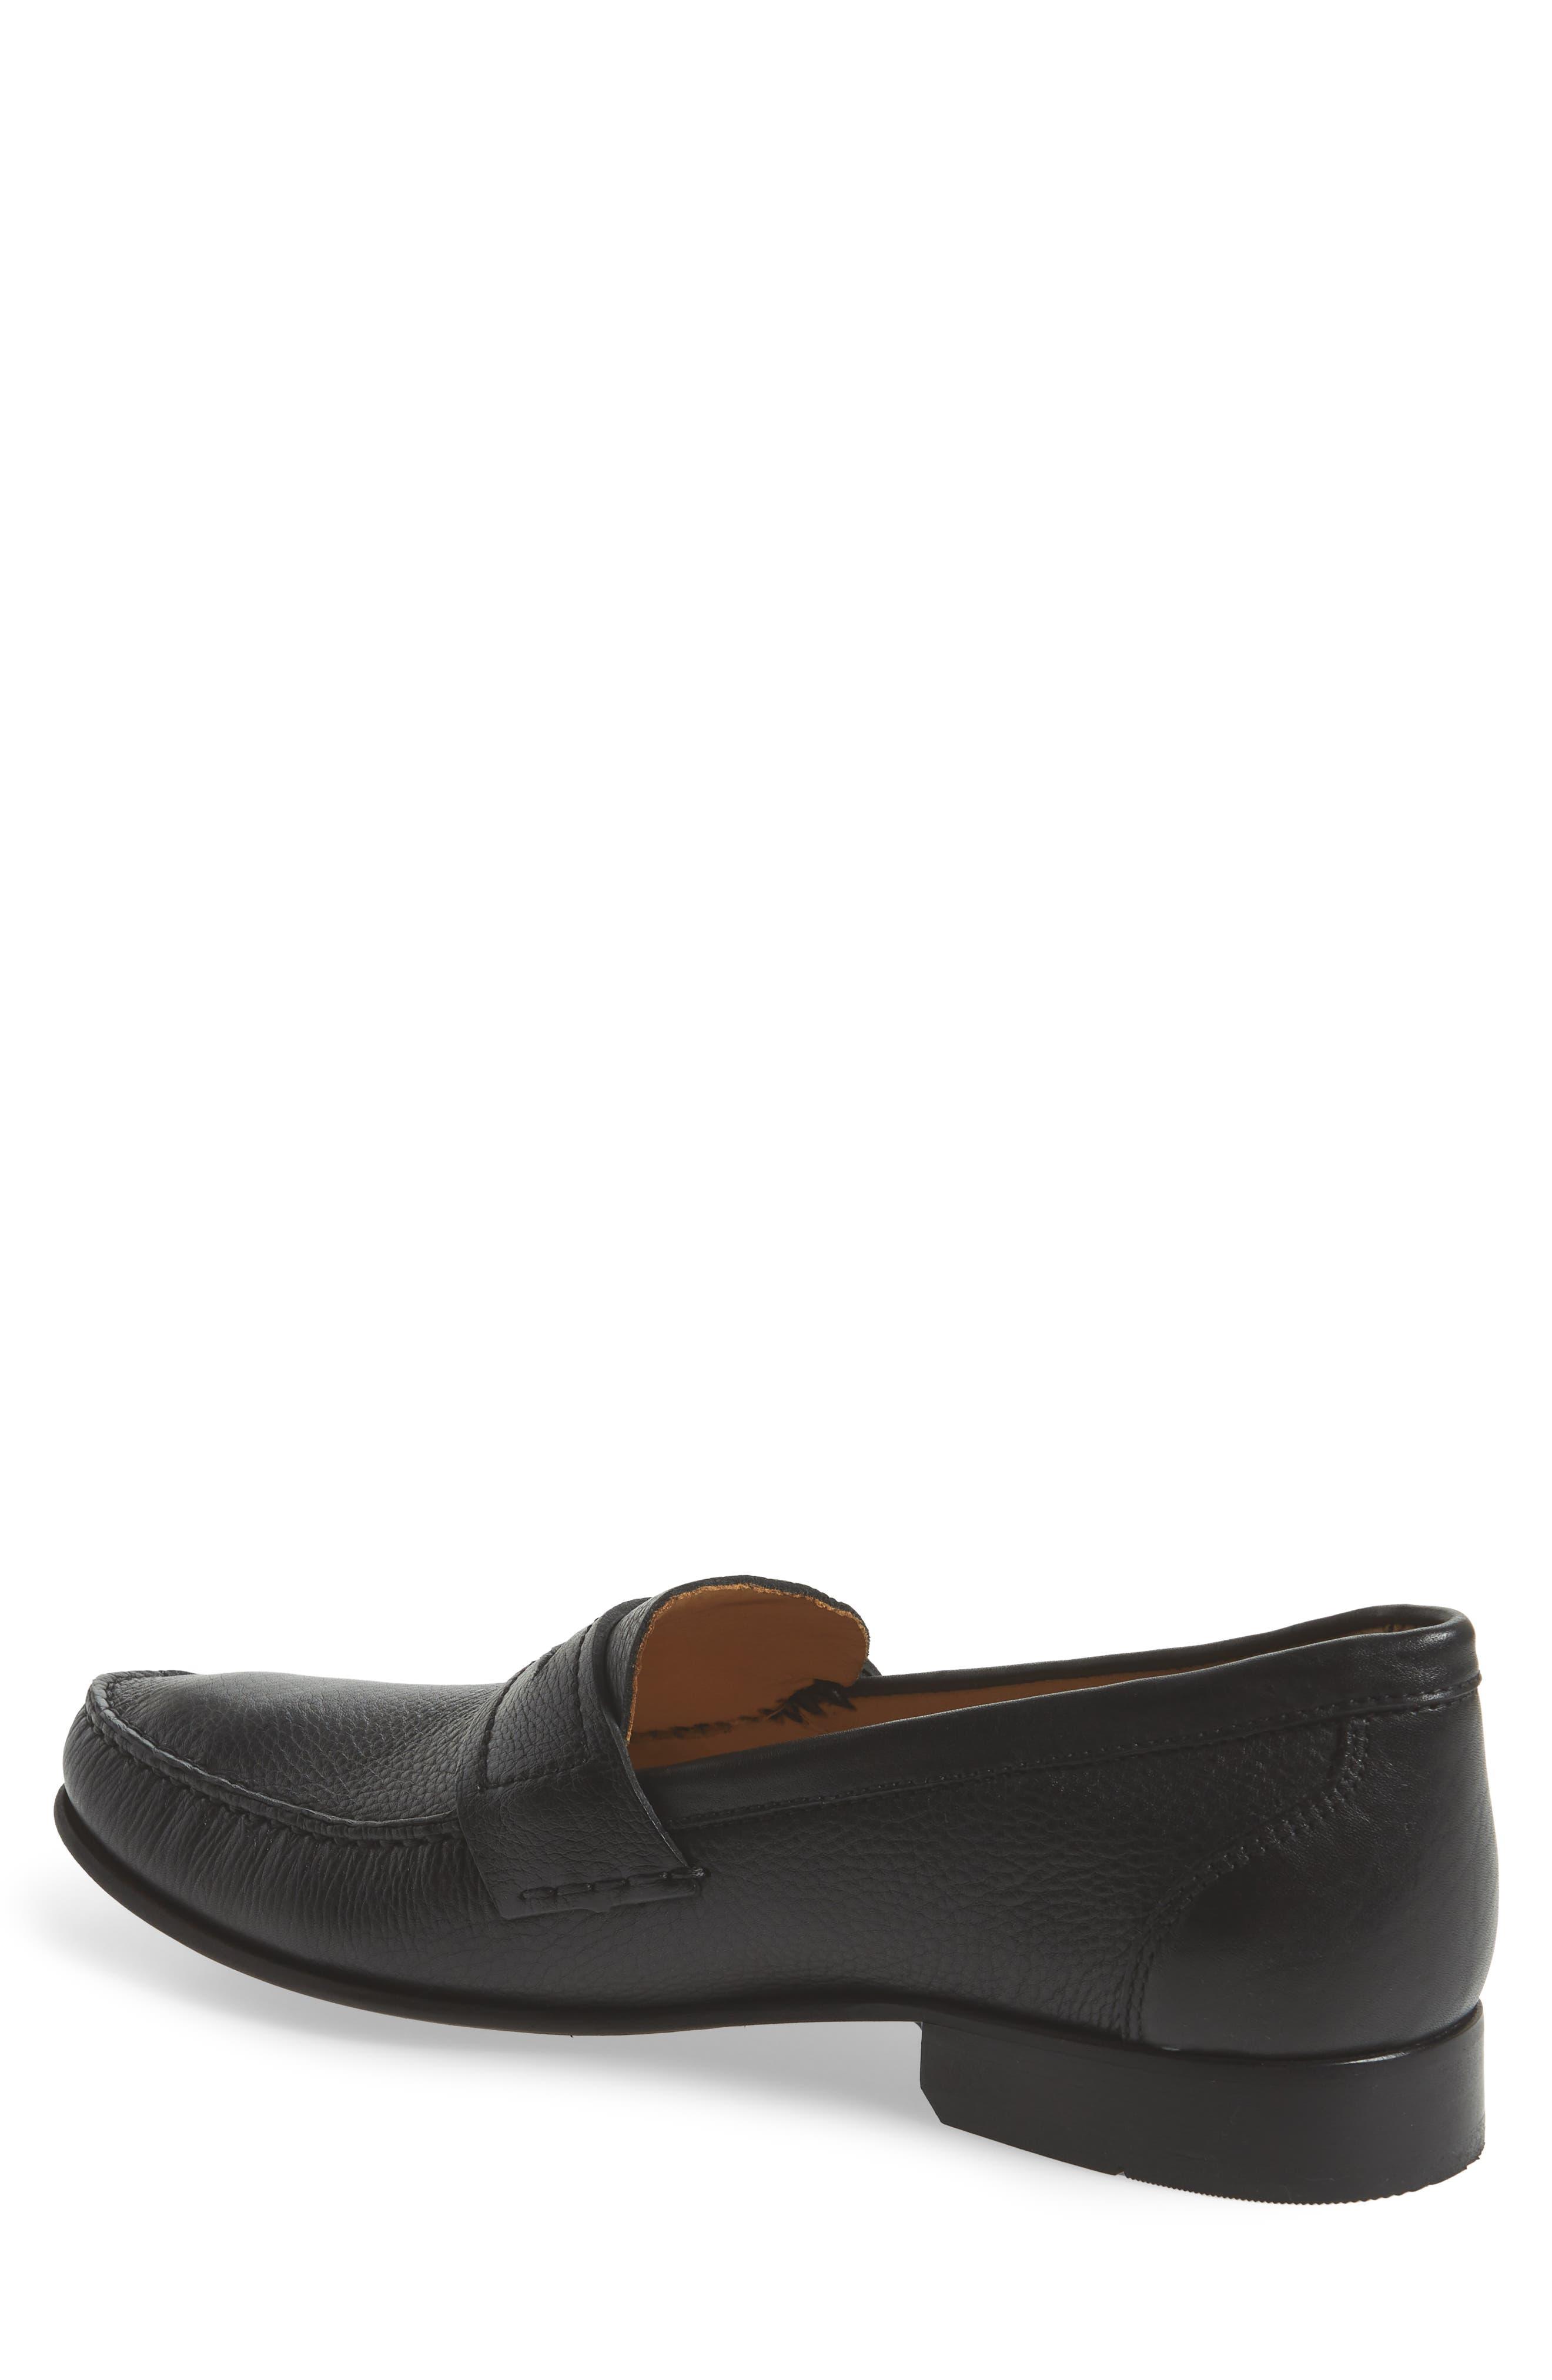 Eric Moc Toe Slip-On Loafer,                             Alternate thumbnail 2, color,                             Floater Black Leather